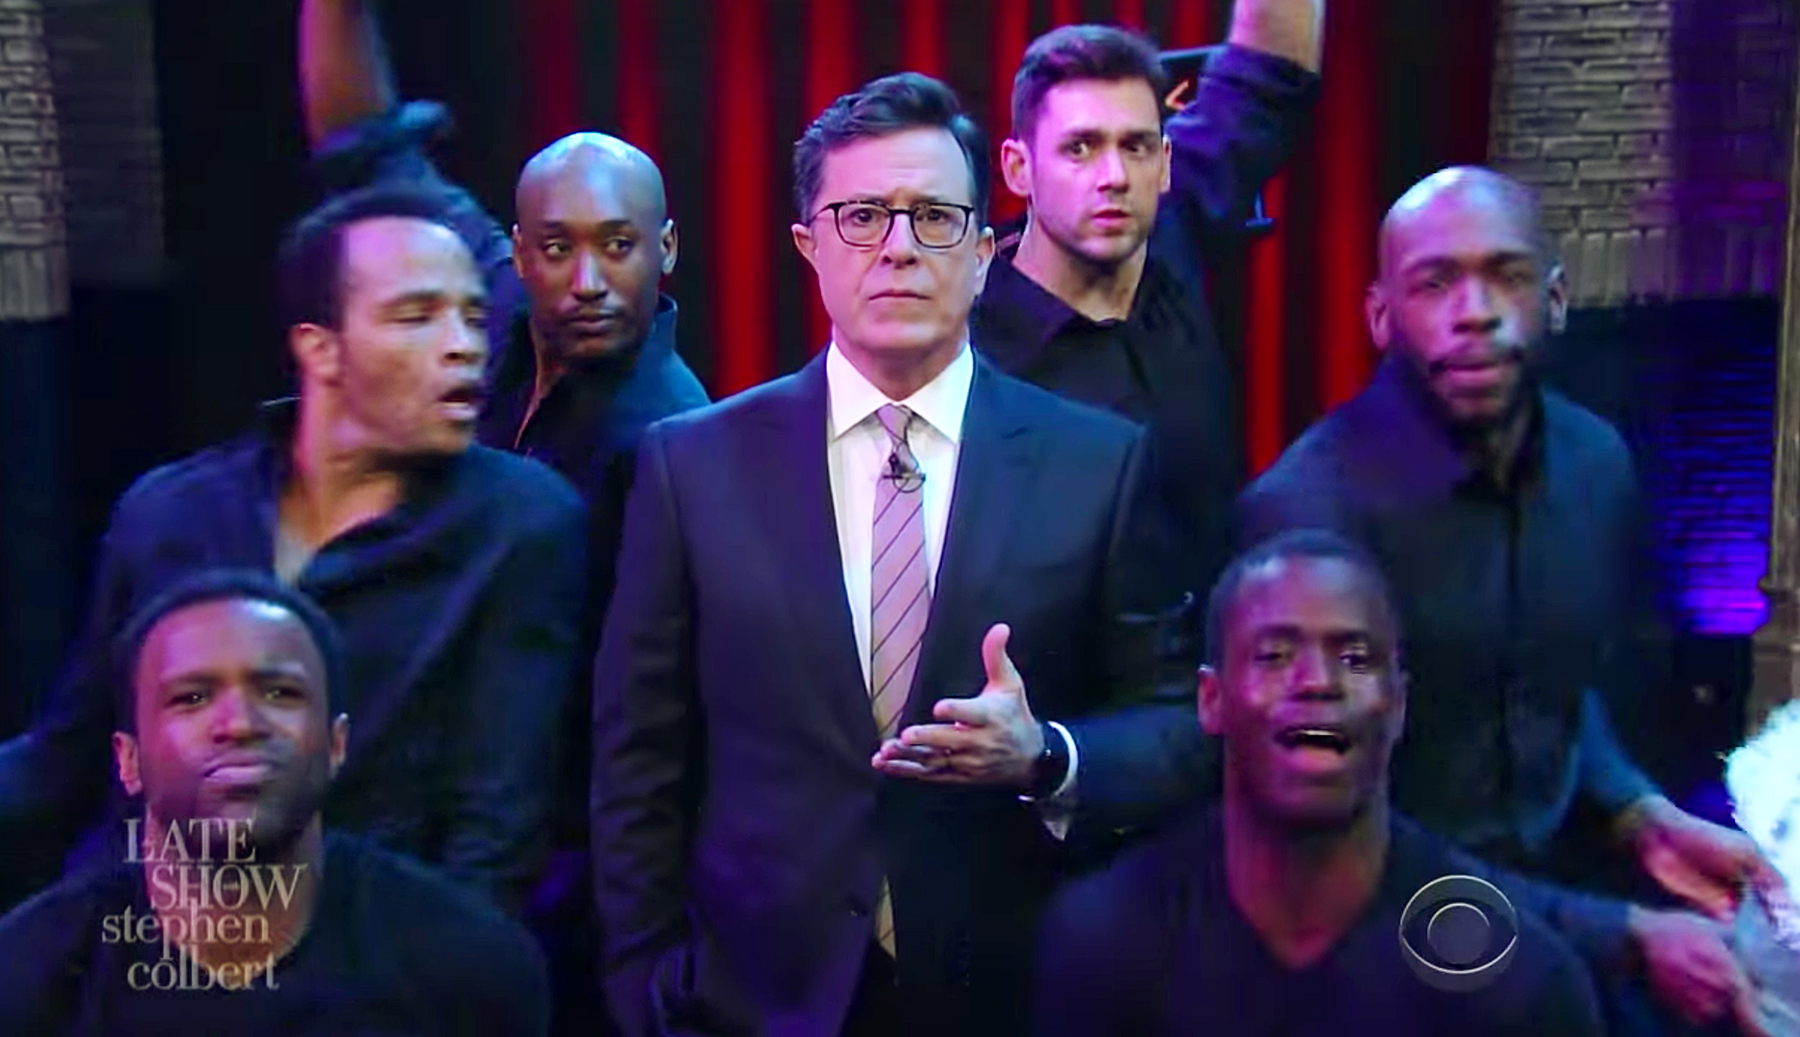 Stephen Colbert parodies Mariah Carey